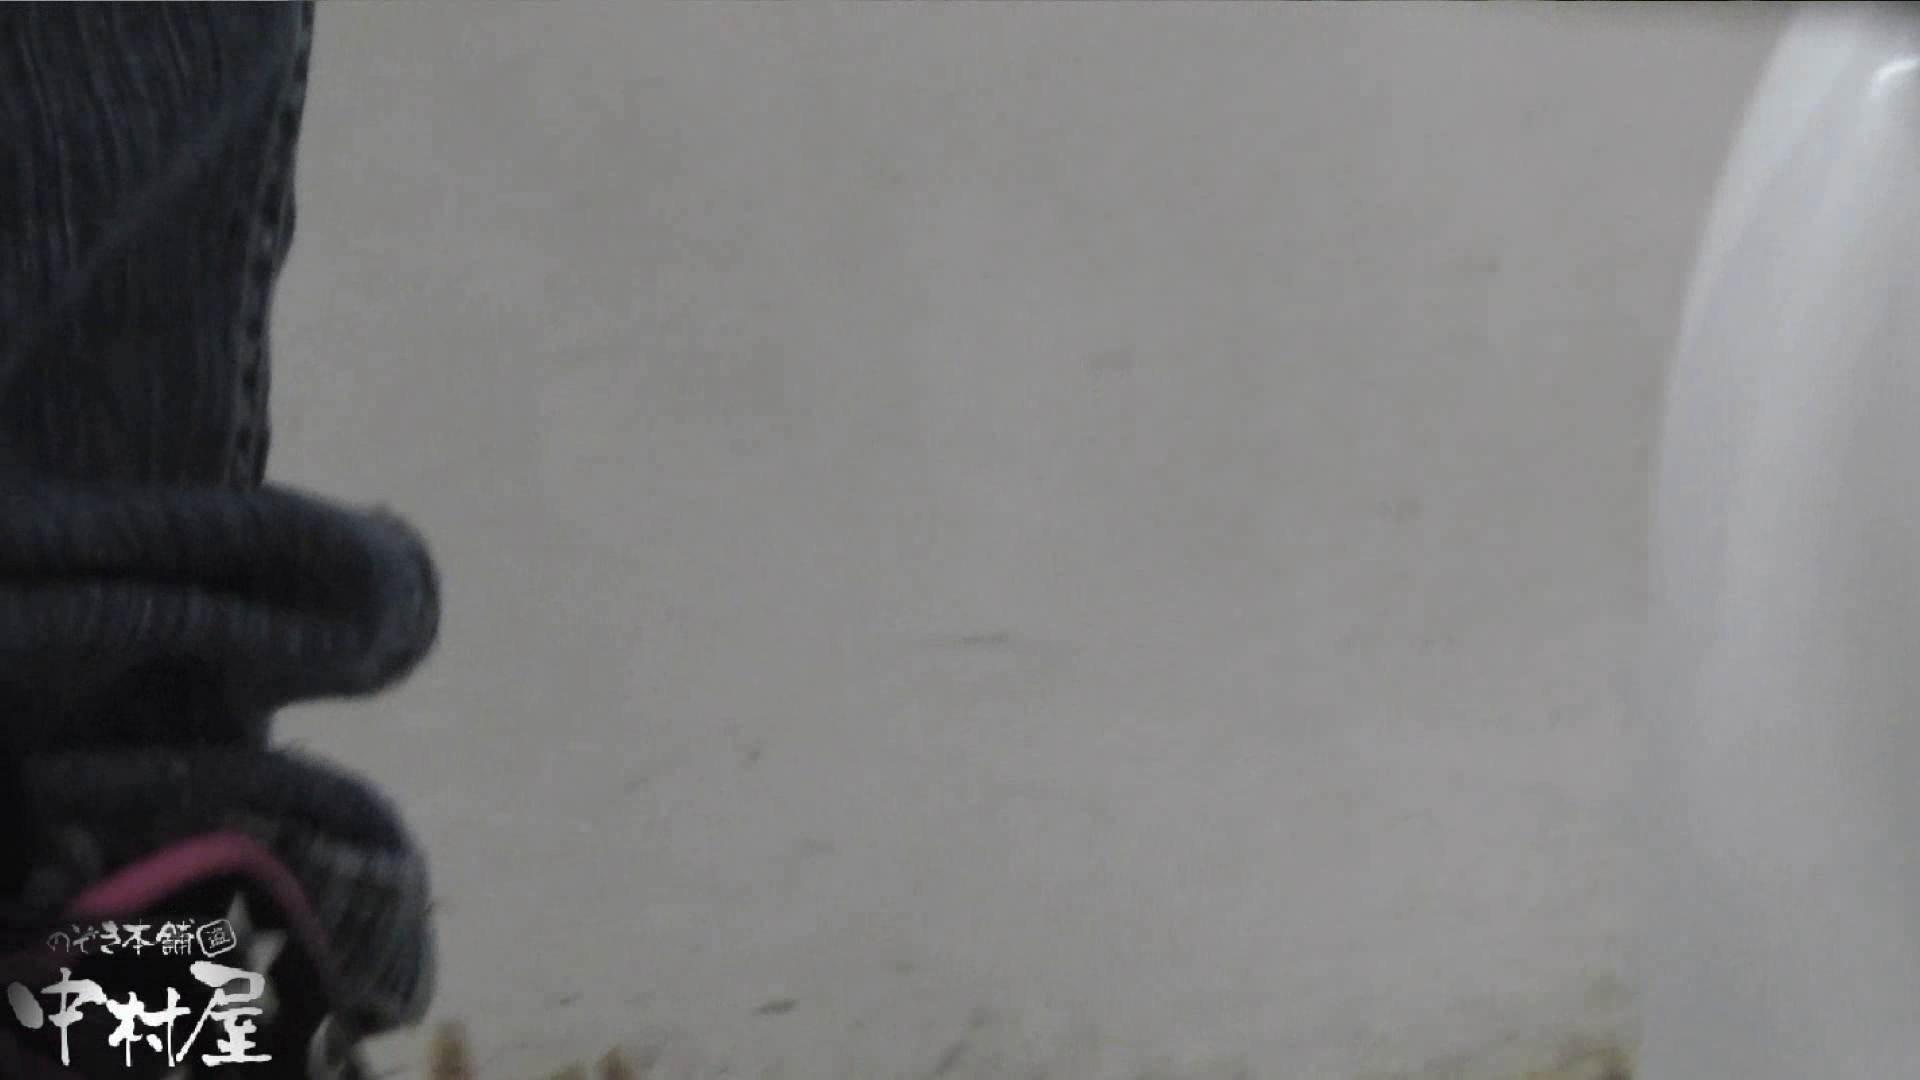 vol.12 命がけ潜伏洗面所! ツイてるね♥ 潜入 盗み撮り動画 96連発 14